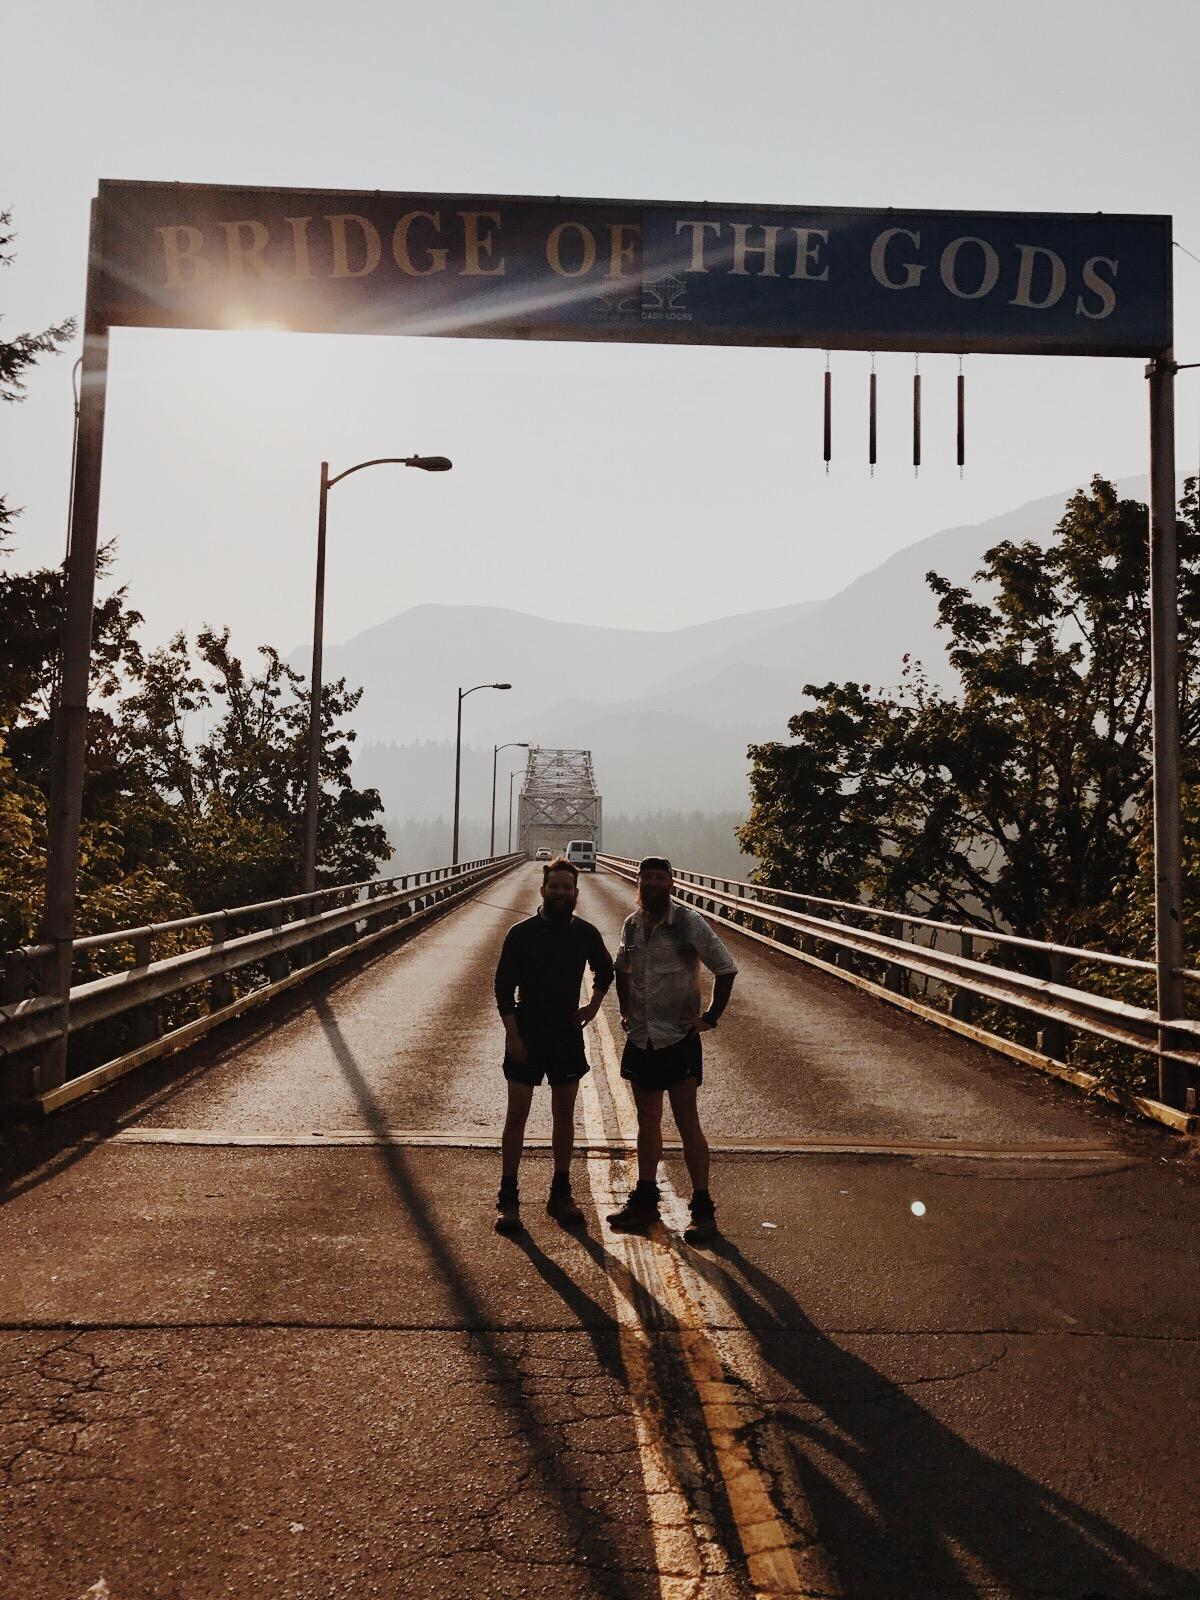 Bridge of the Gods. Finally.